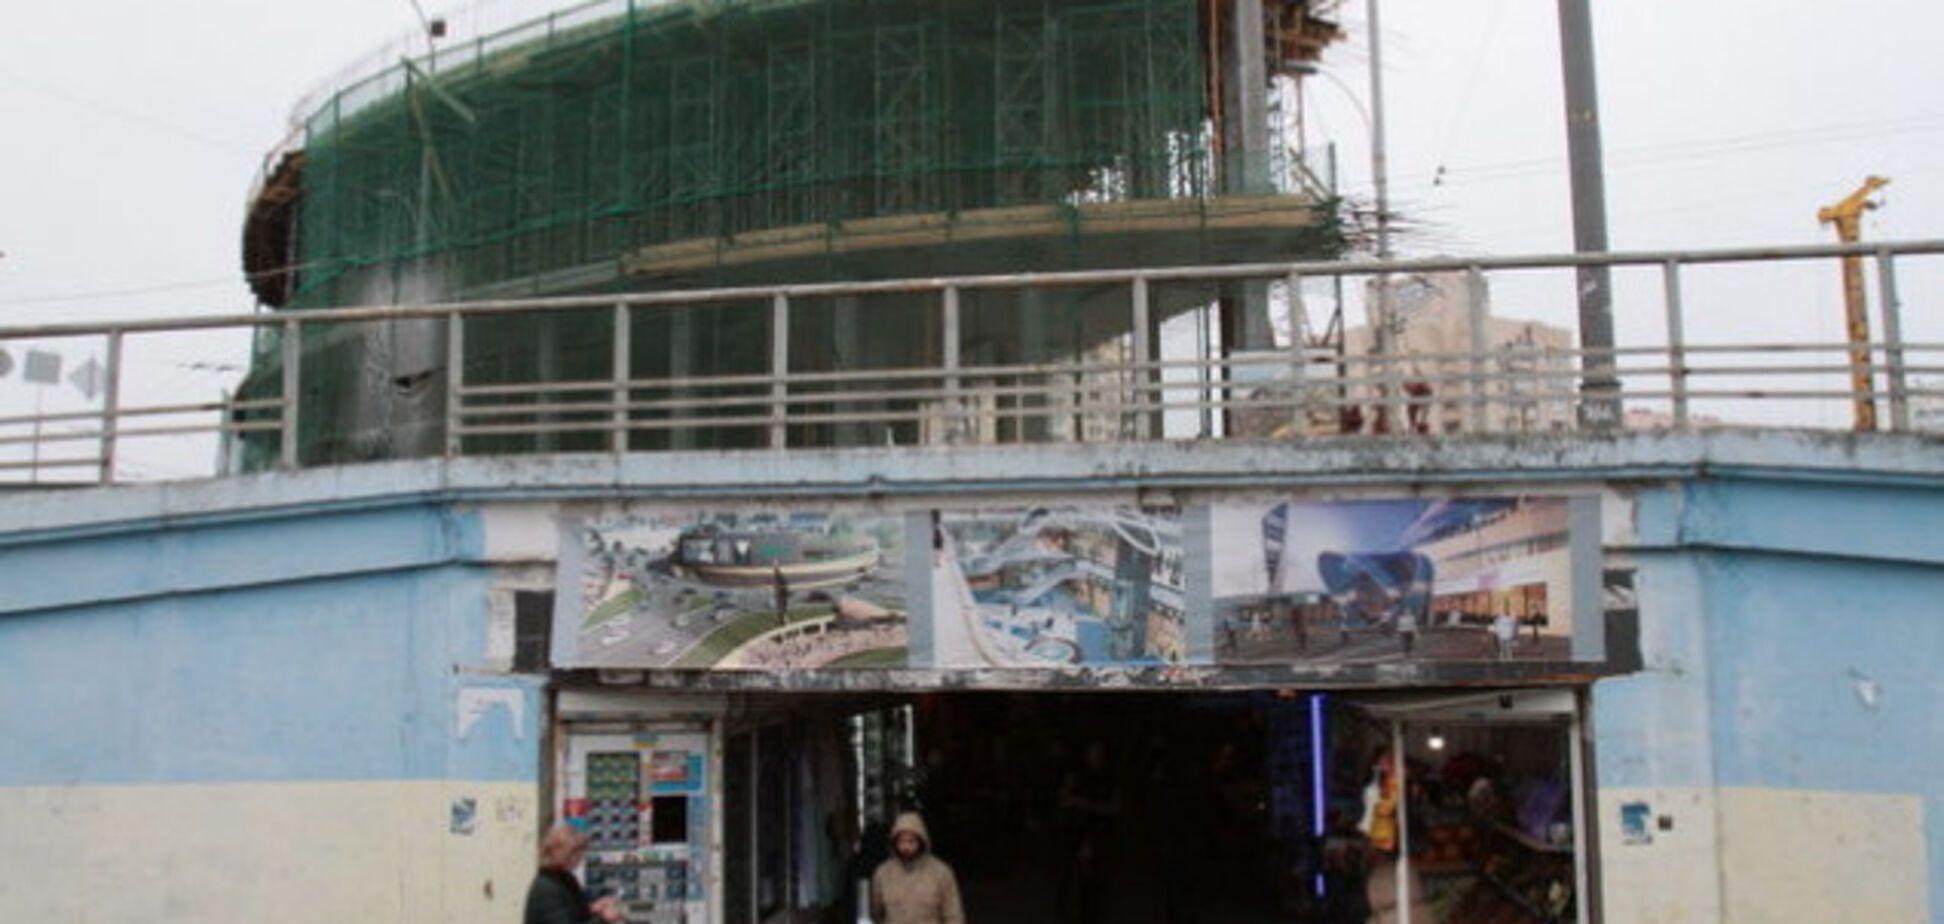 На станции 'Героев Днепра' закрывают один выход: куда идти пассажирам